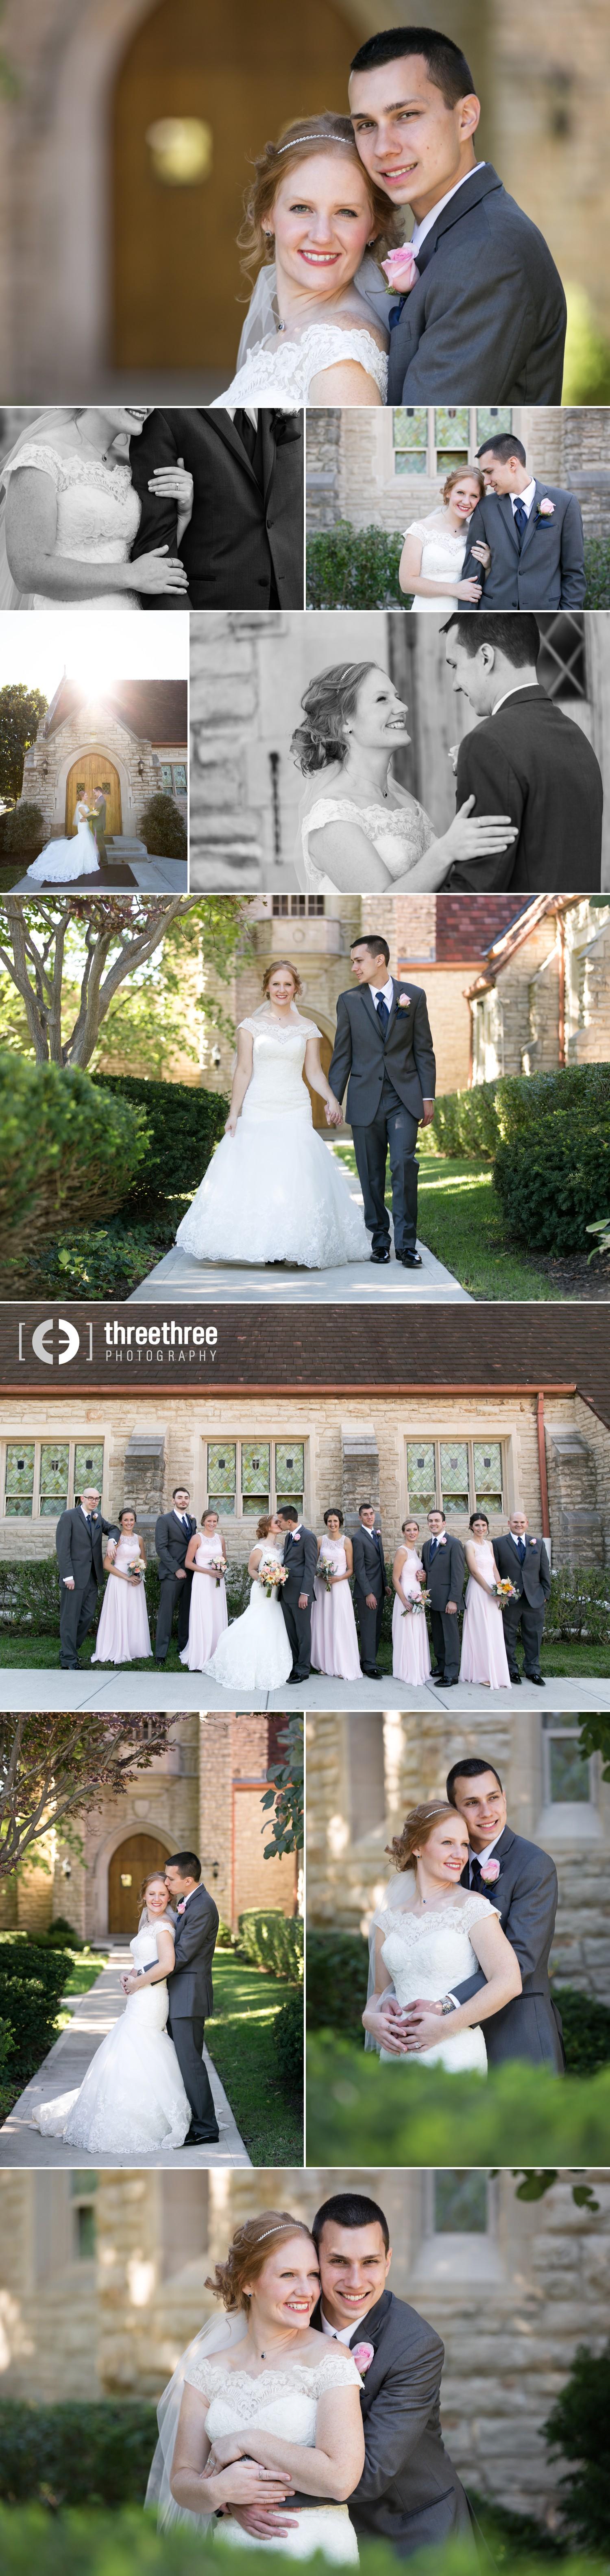 Temerity_KC Wedding Photography 4.jpg